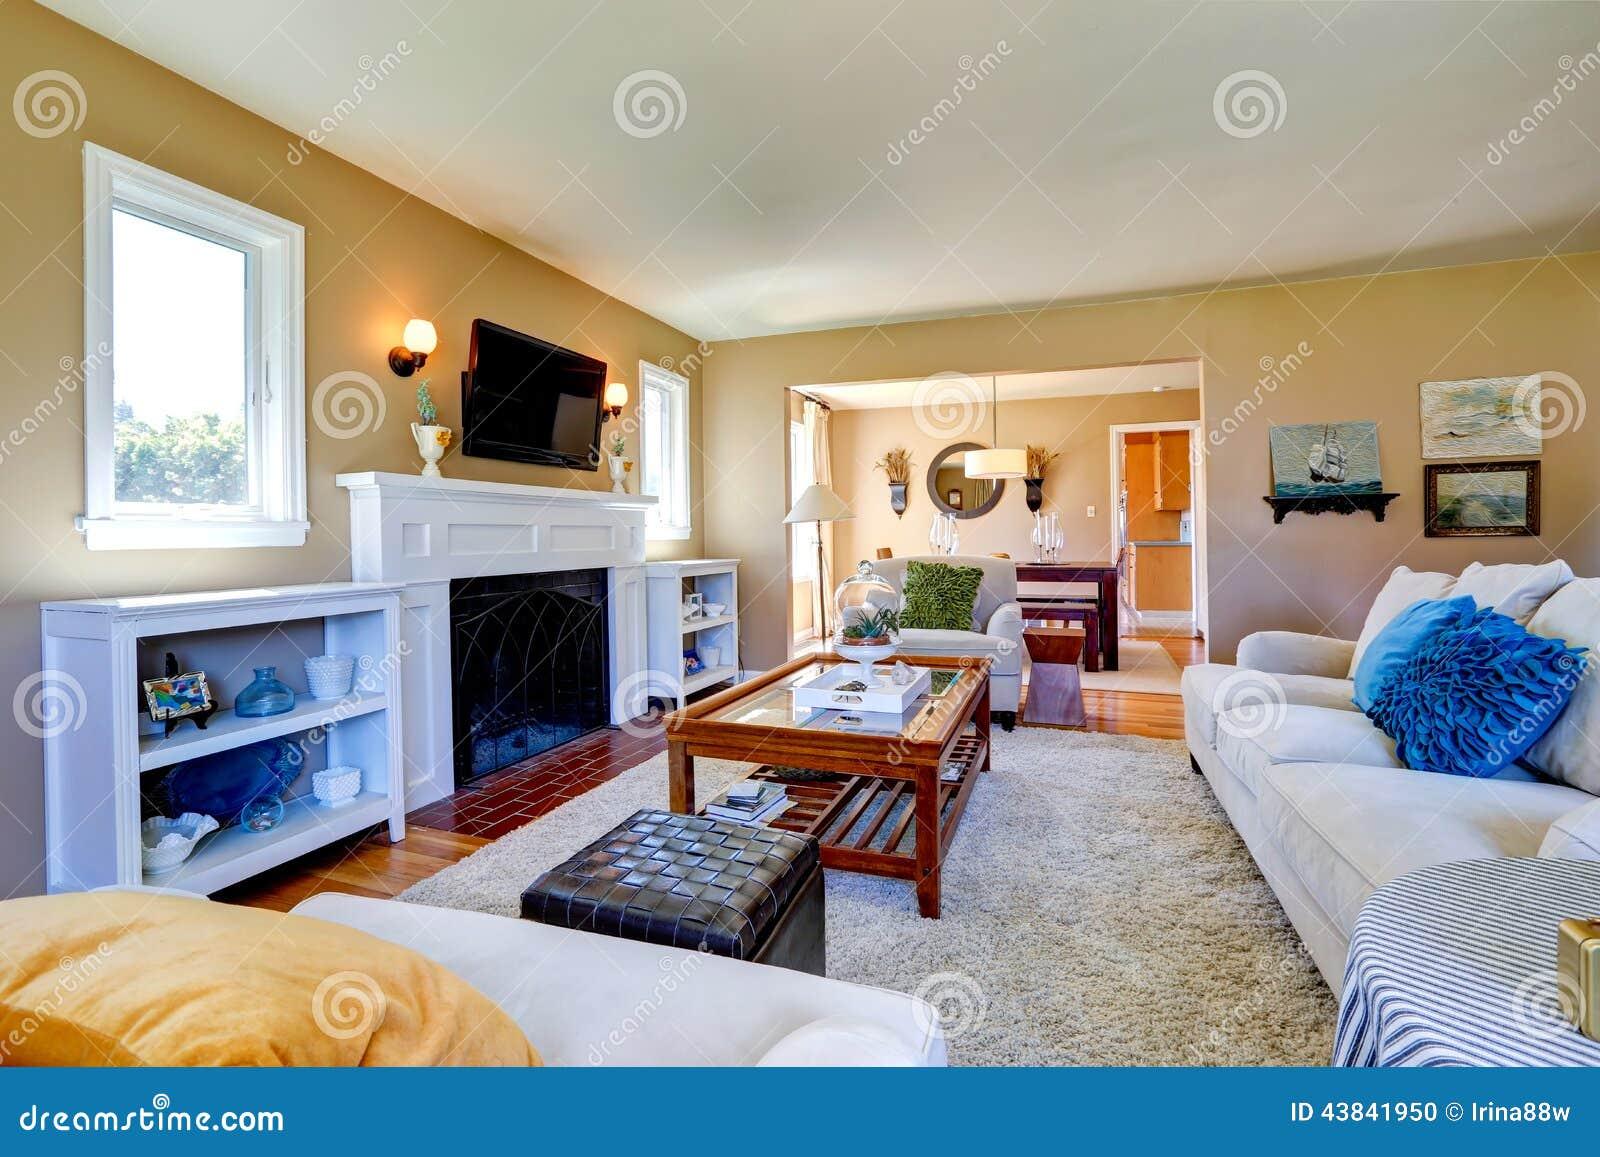 Cozy Living Room Vector Free Download